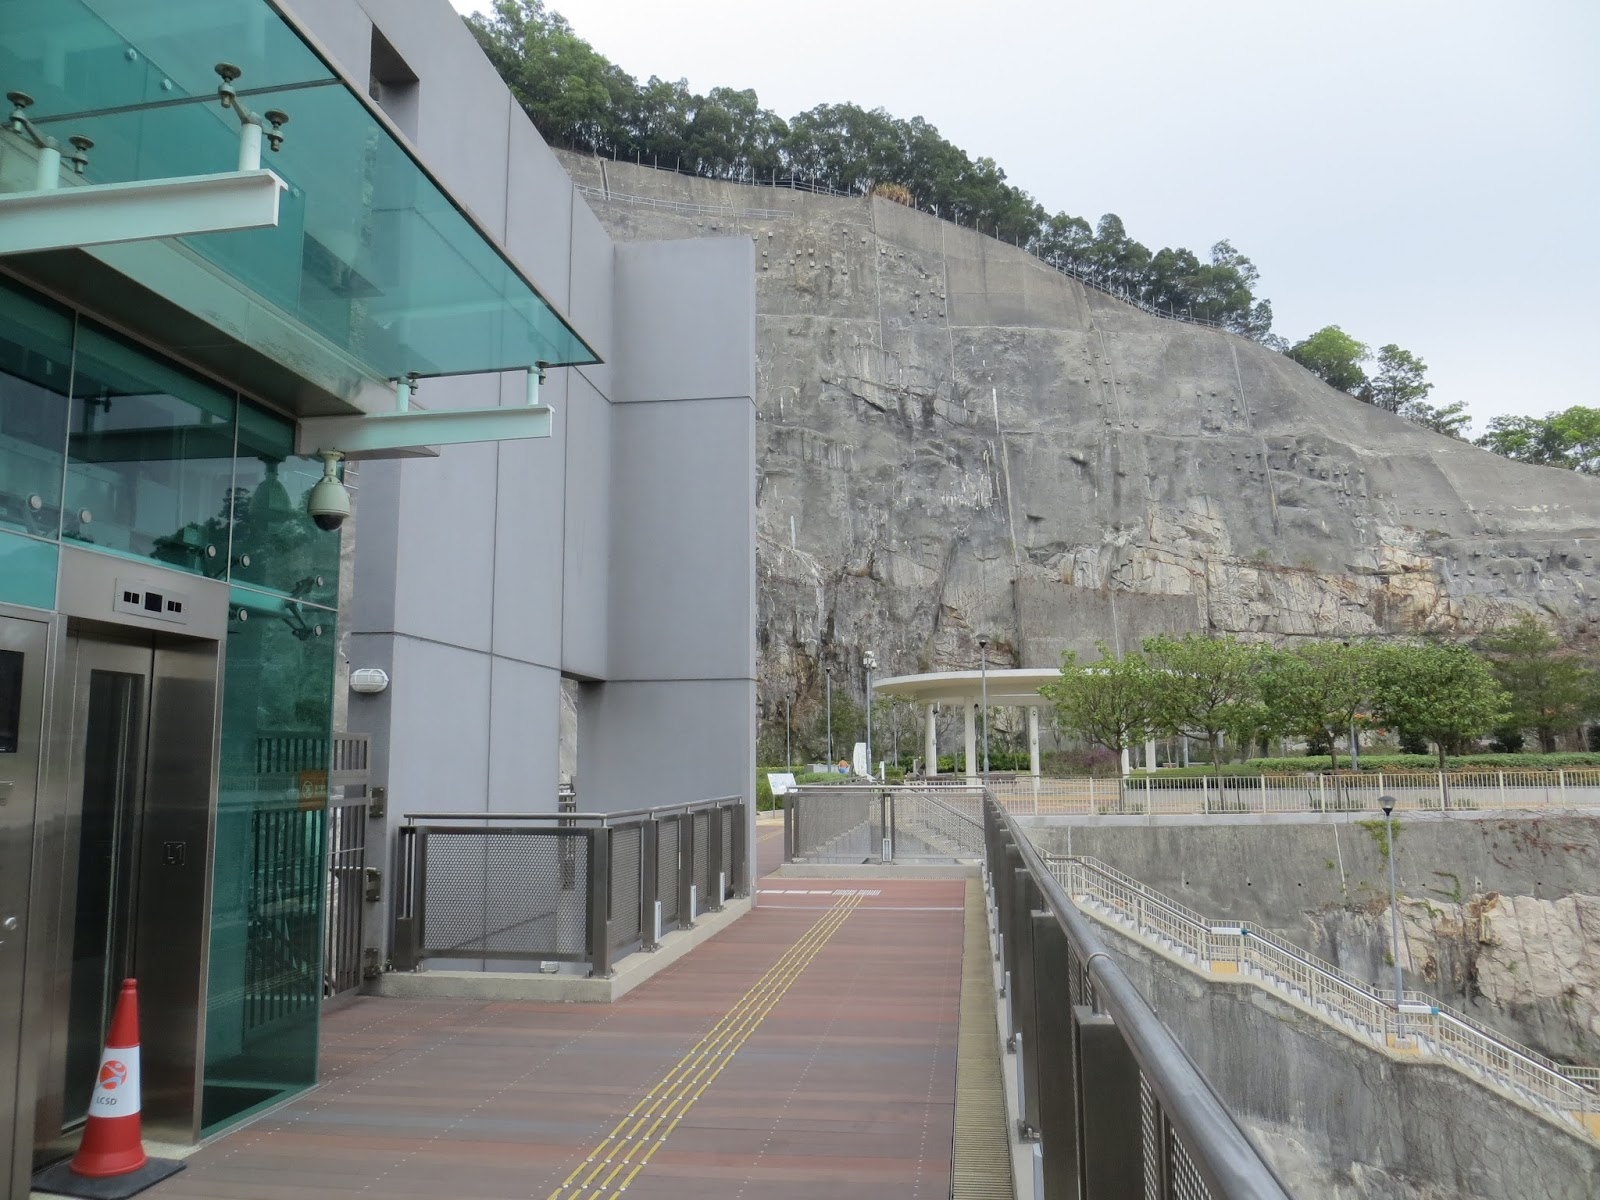 Allan's Blogspot: 彩榮路公園和佐敦谷公園